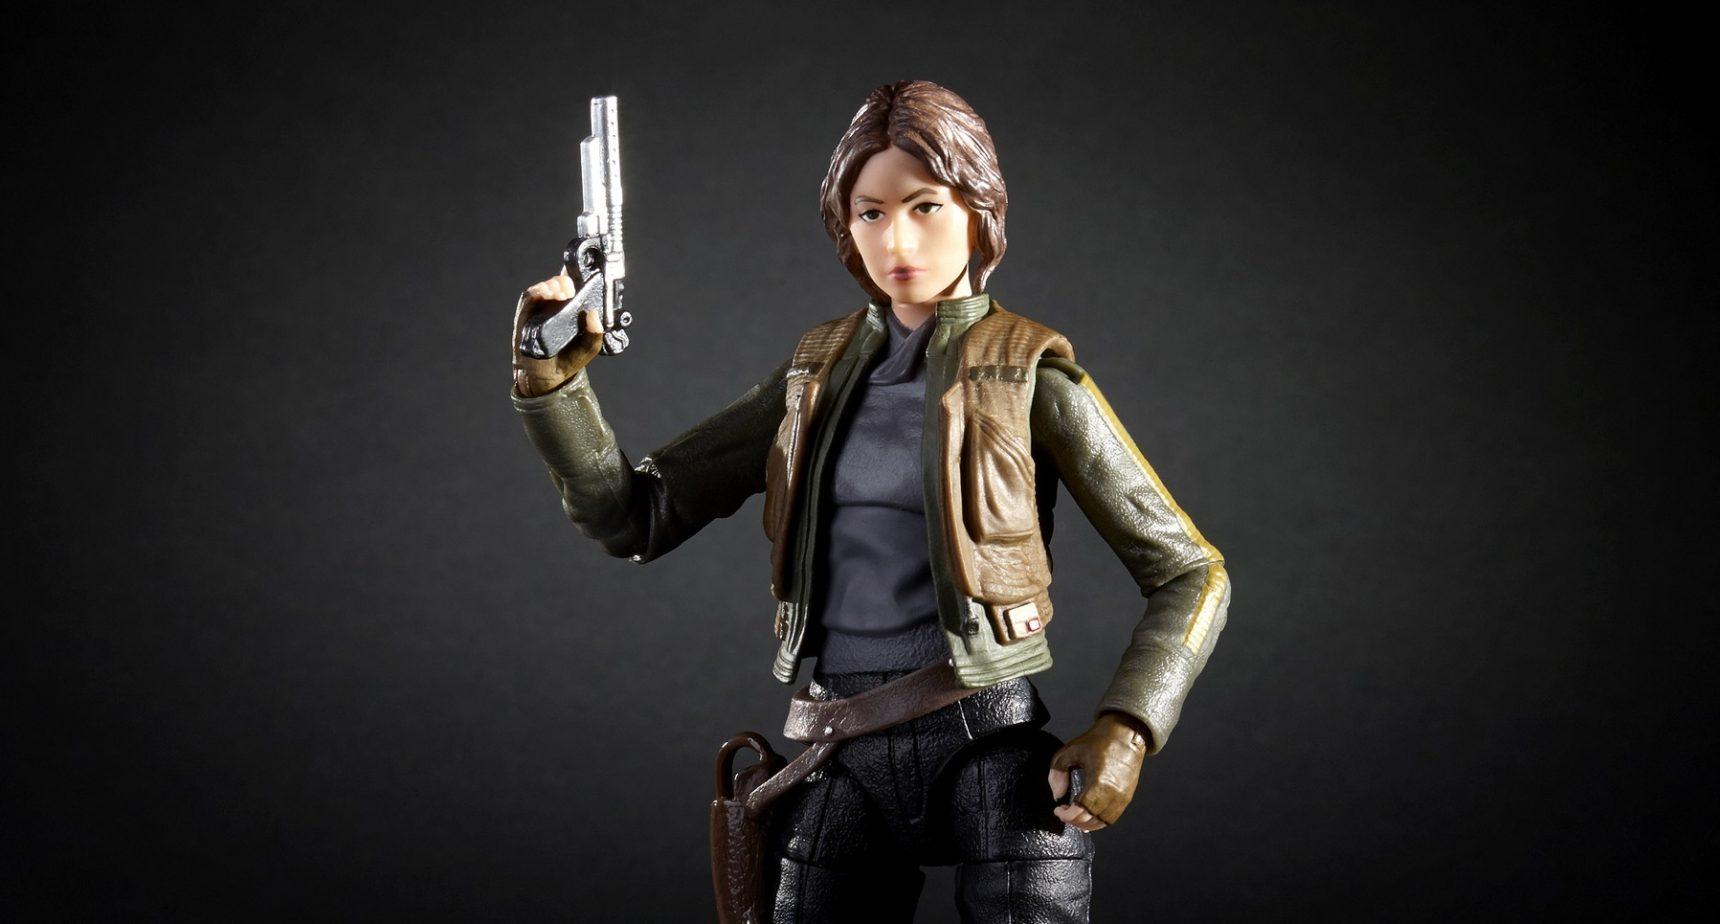 Hasbro Black Series Jyn Erso 6 inch Figur vorgestellt